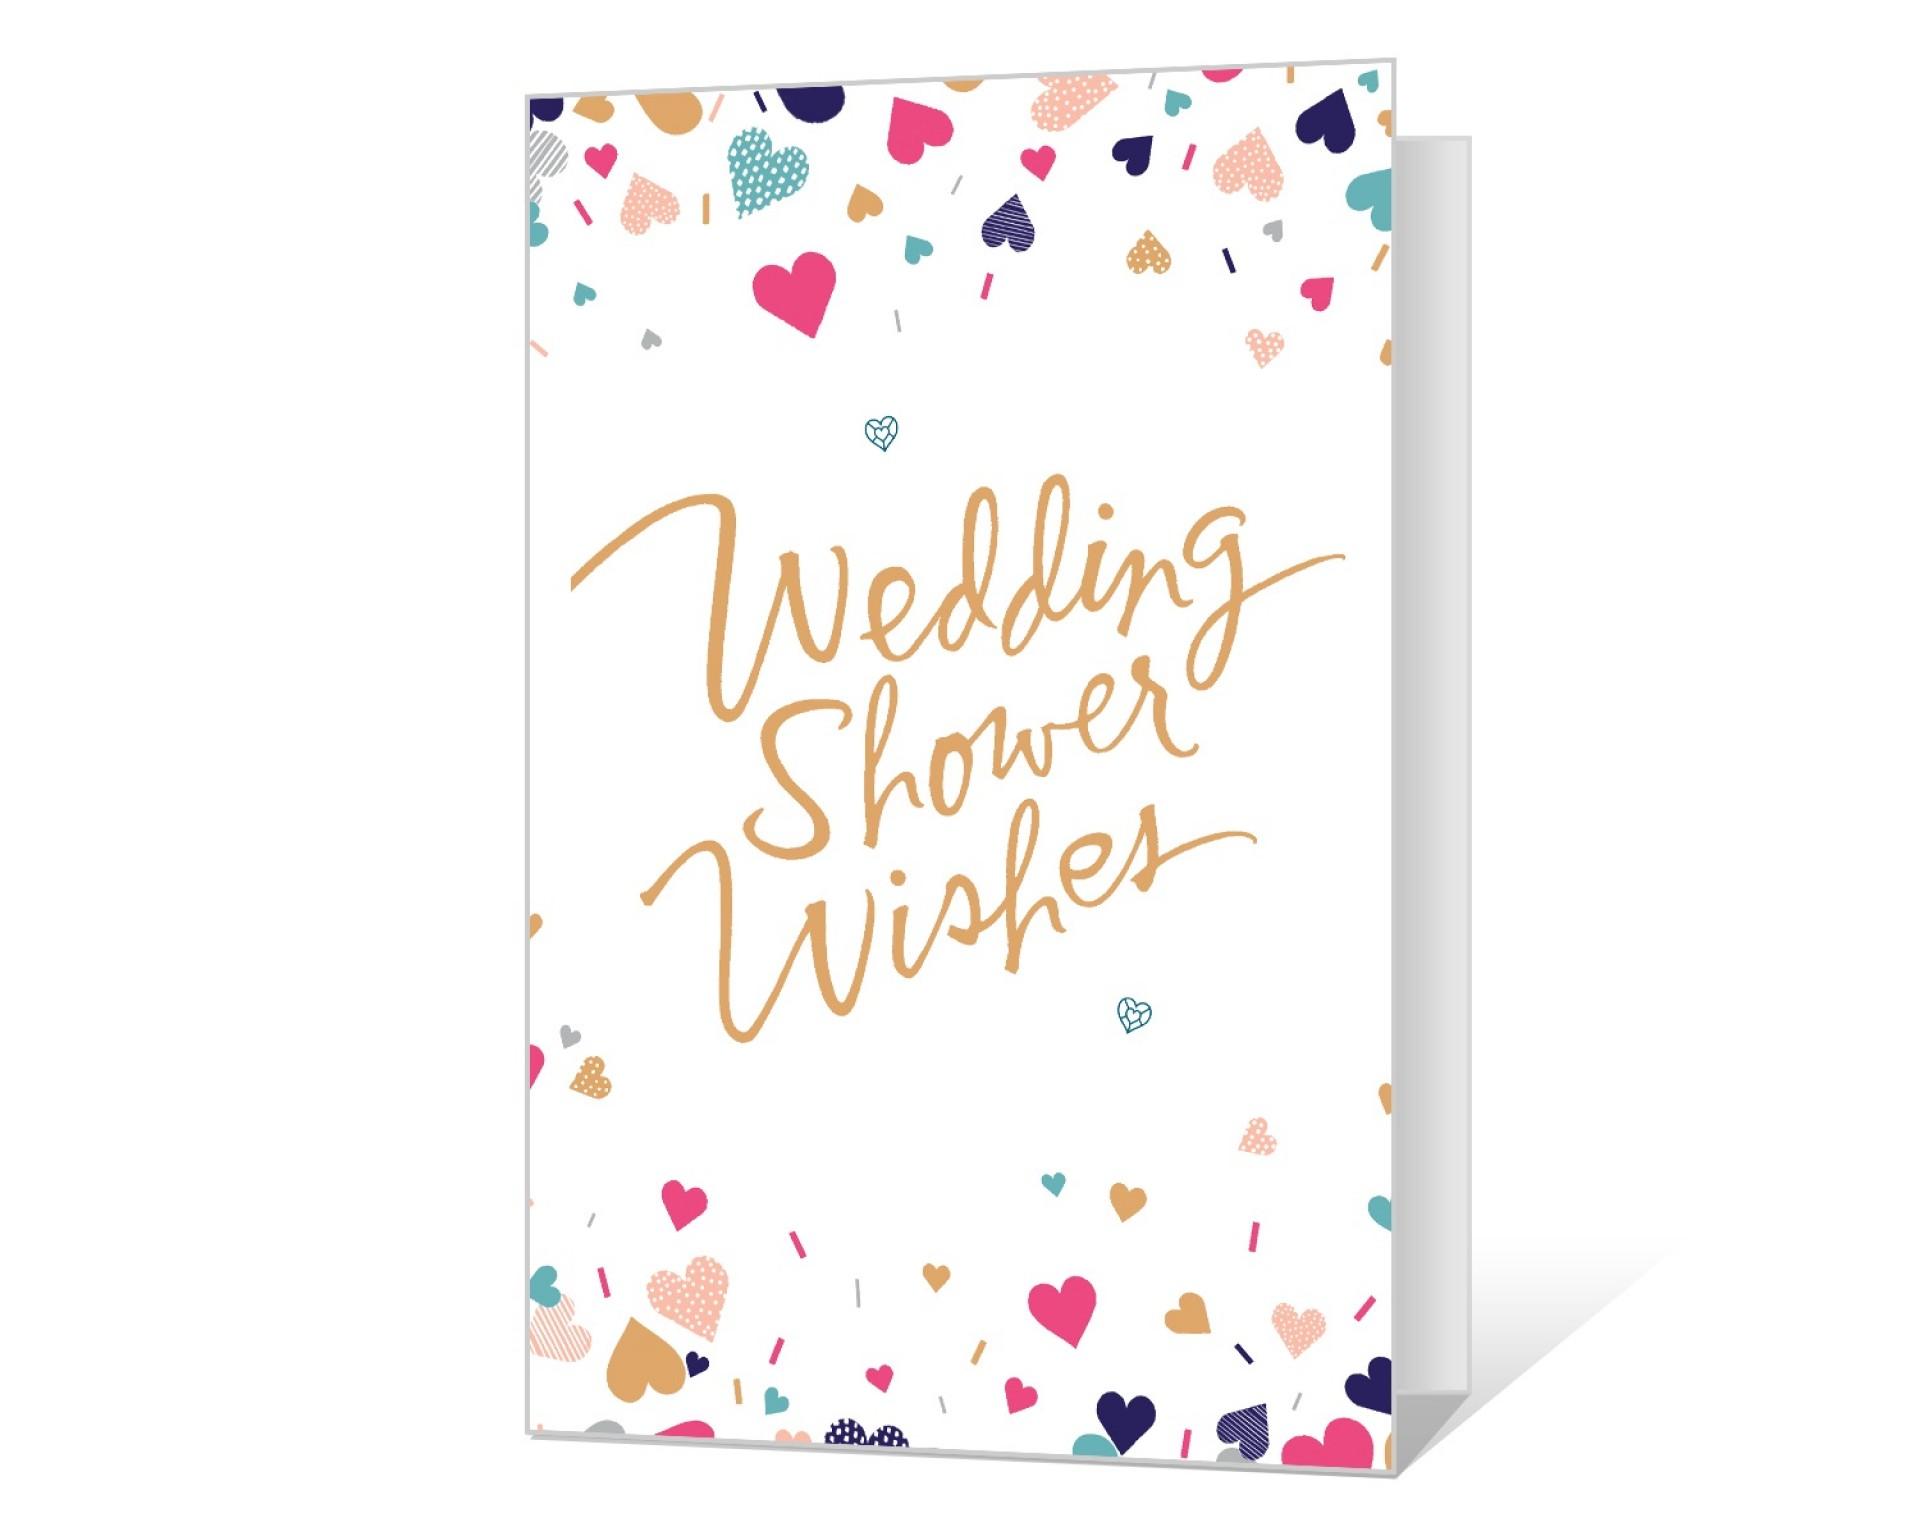 008 Remarkable Bridal Shower Card Template Concept  Invitation Free Download Bingo1920